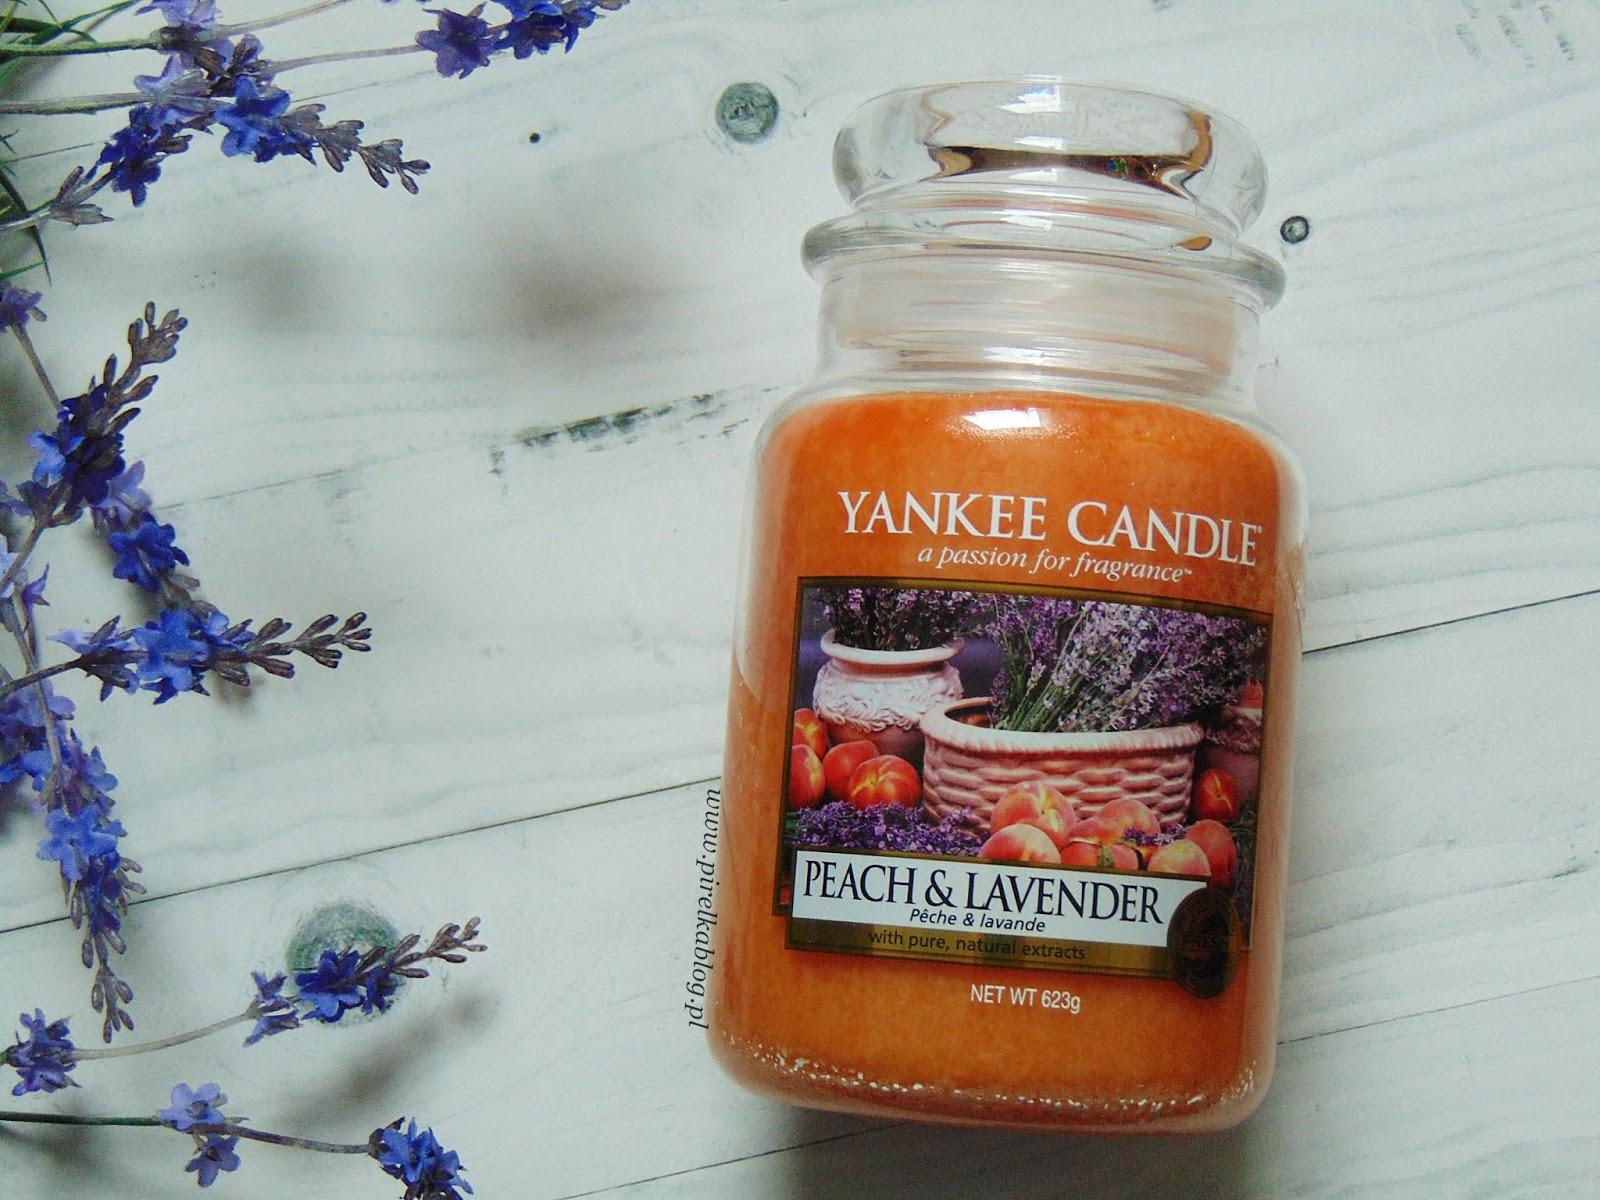 Świeca Yankee Candle 'Peach & Lavender'